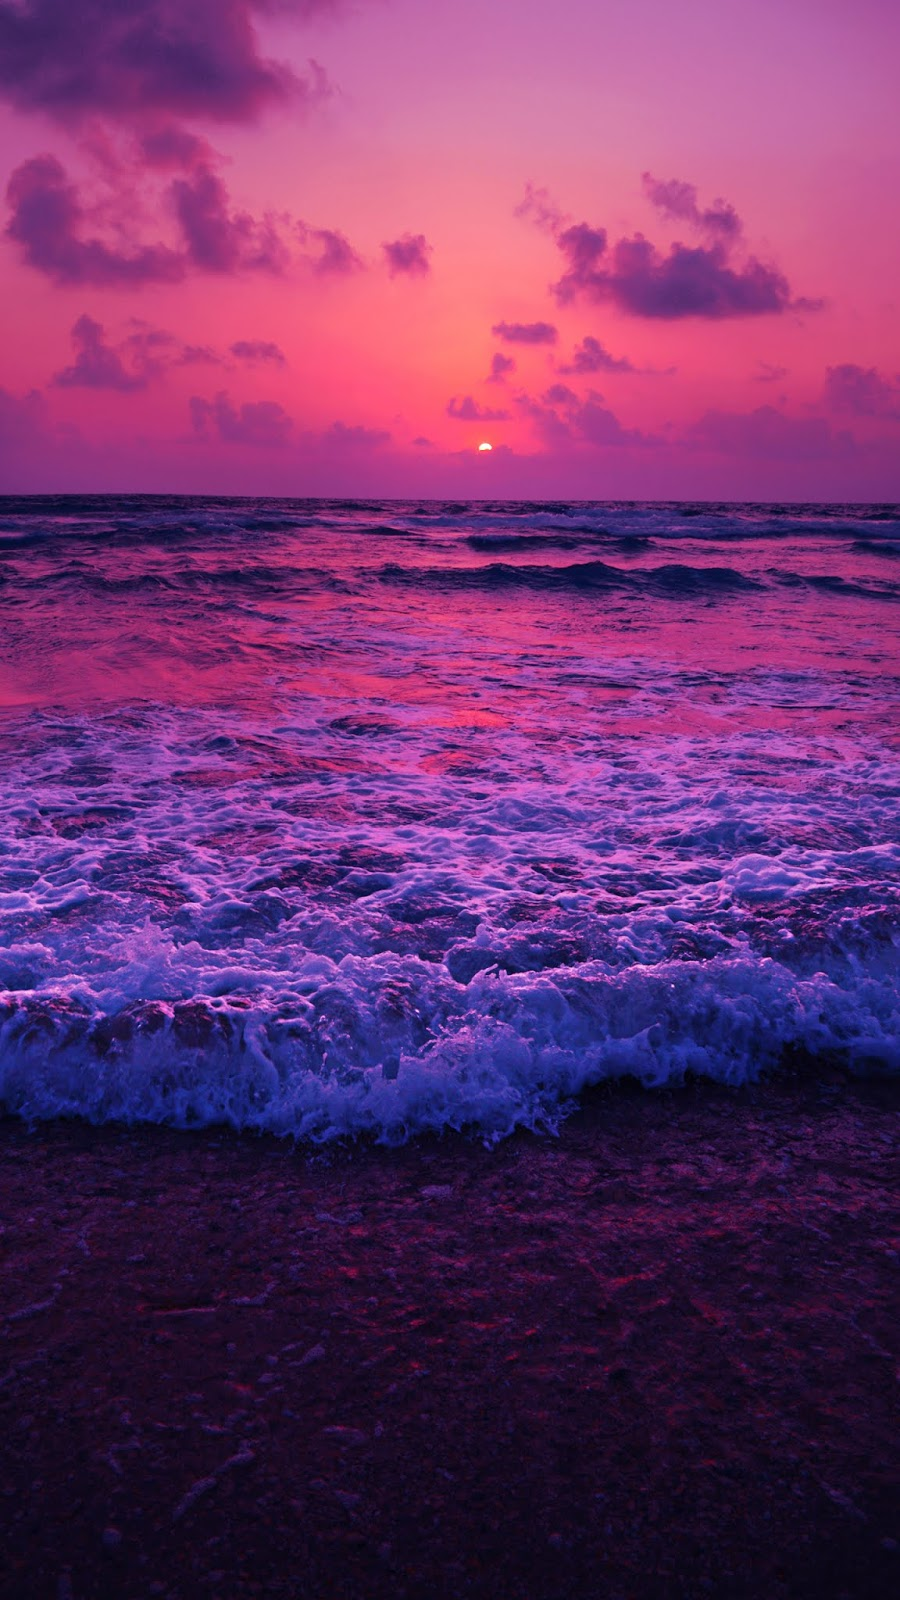 Beach in the twilight sunset